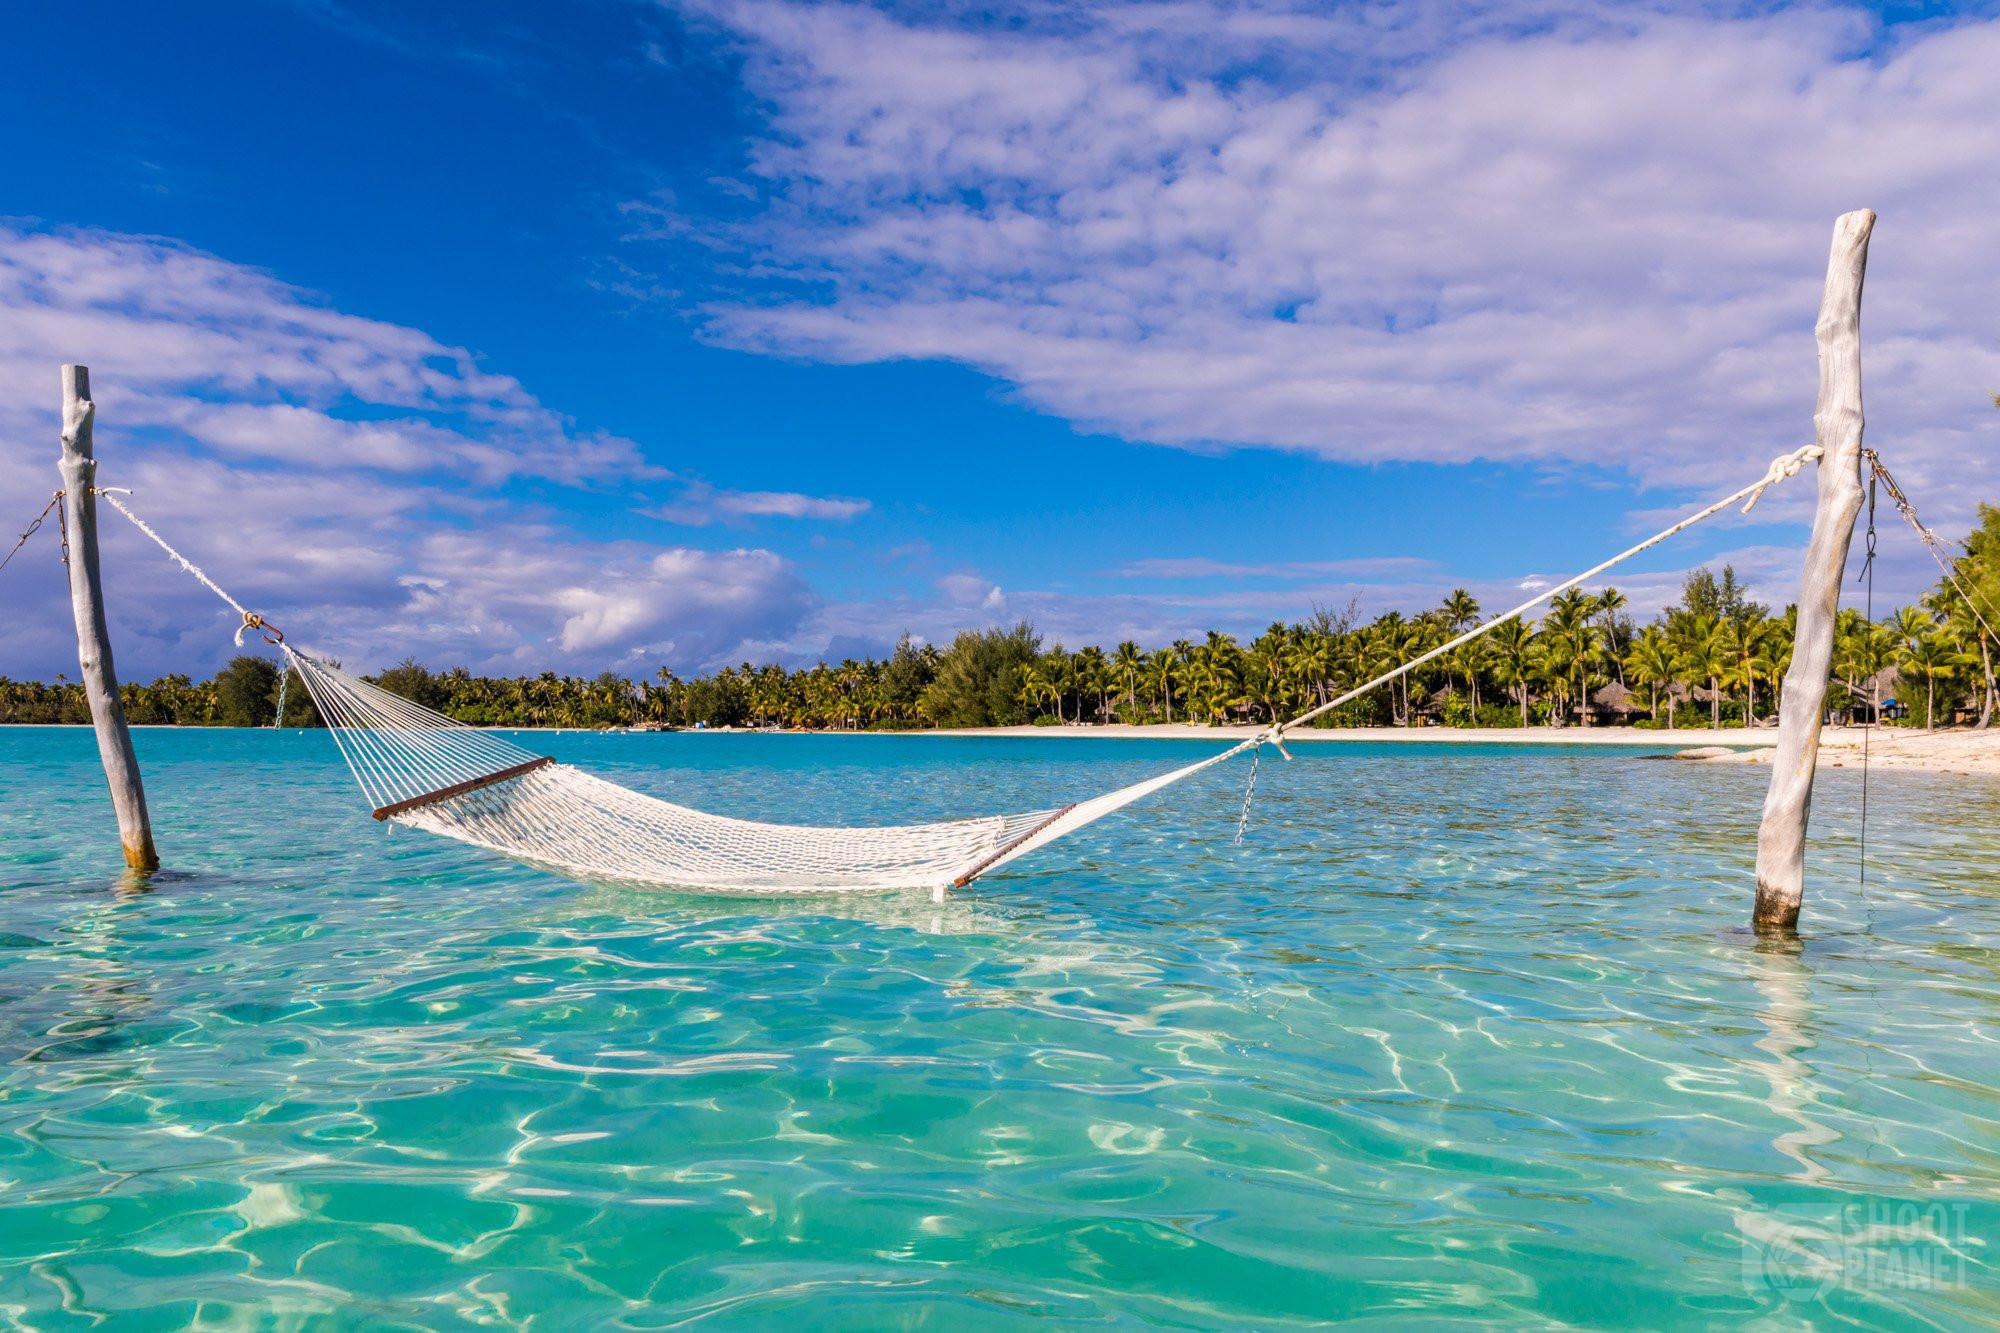 Hammock in Bora Bora lagoon